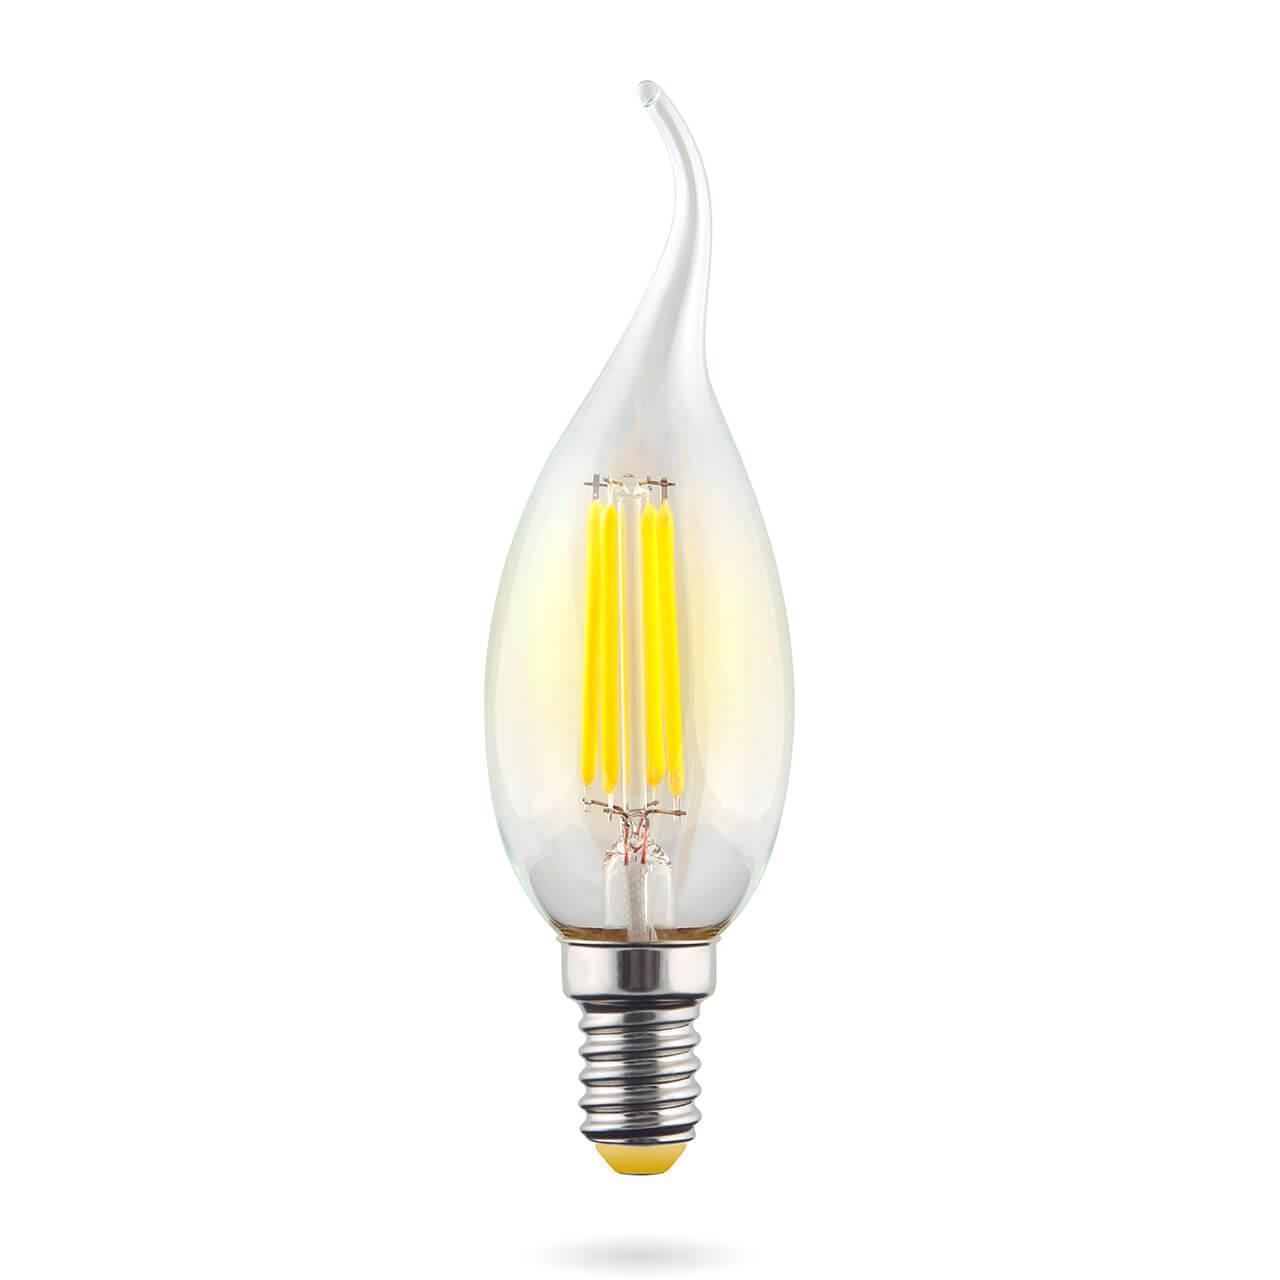 Лампа светодиодная E14 6W 2800К прозрачная VG10-CW1E14warm6W-F 7017 voltega лампа светодиодная voltega свеча на ветру прозрачная e14 6w 2800k vg10 cw1e14warm6w f 7017